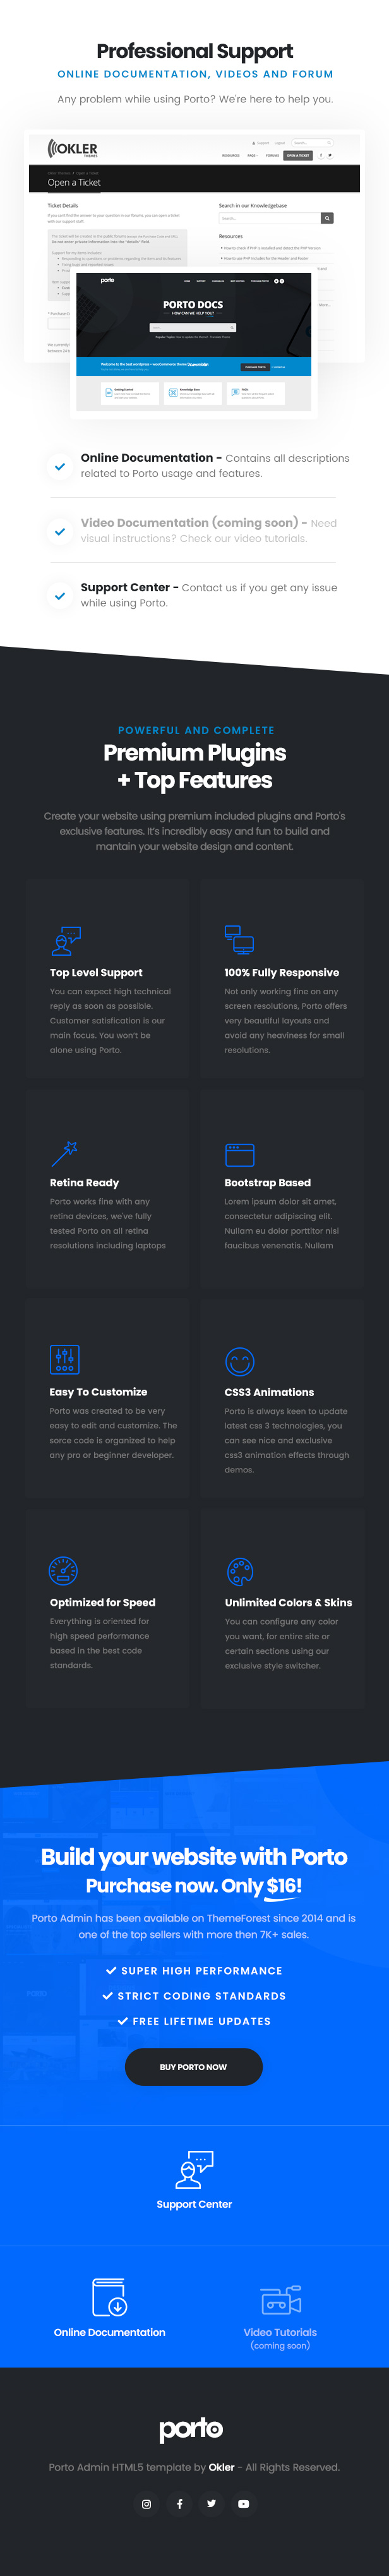 Porto Admin - Responsive HTML5 Template - 4